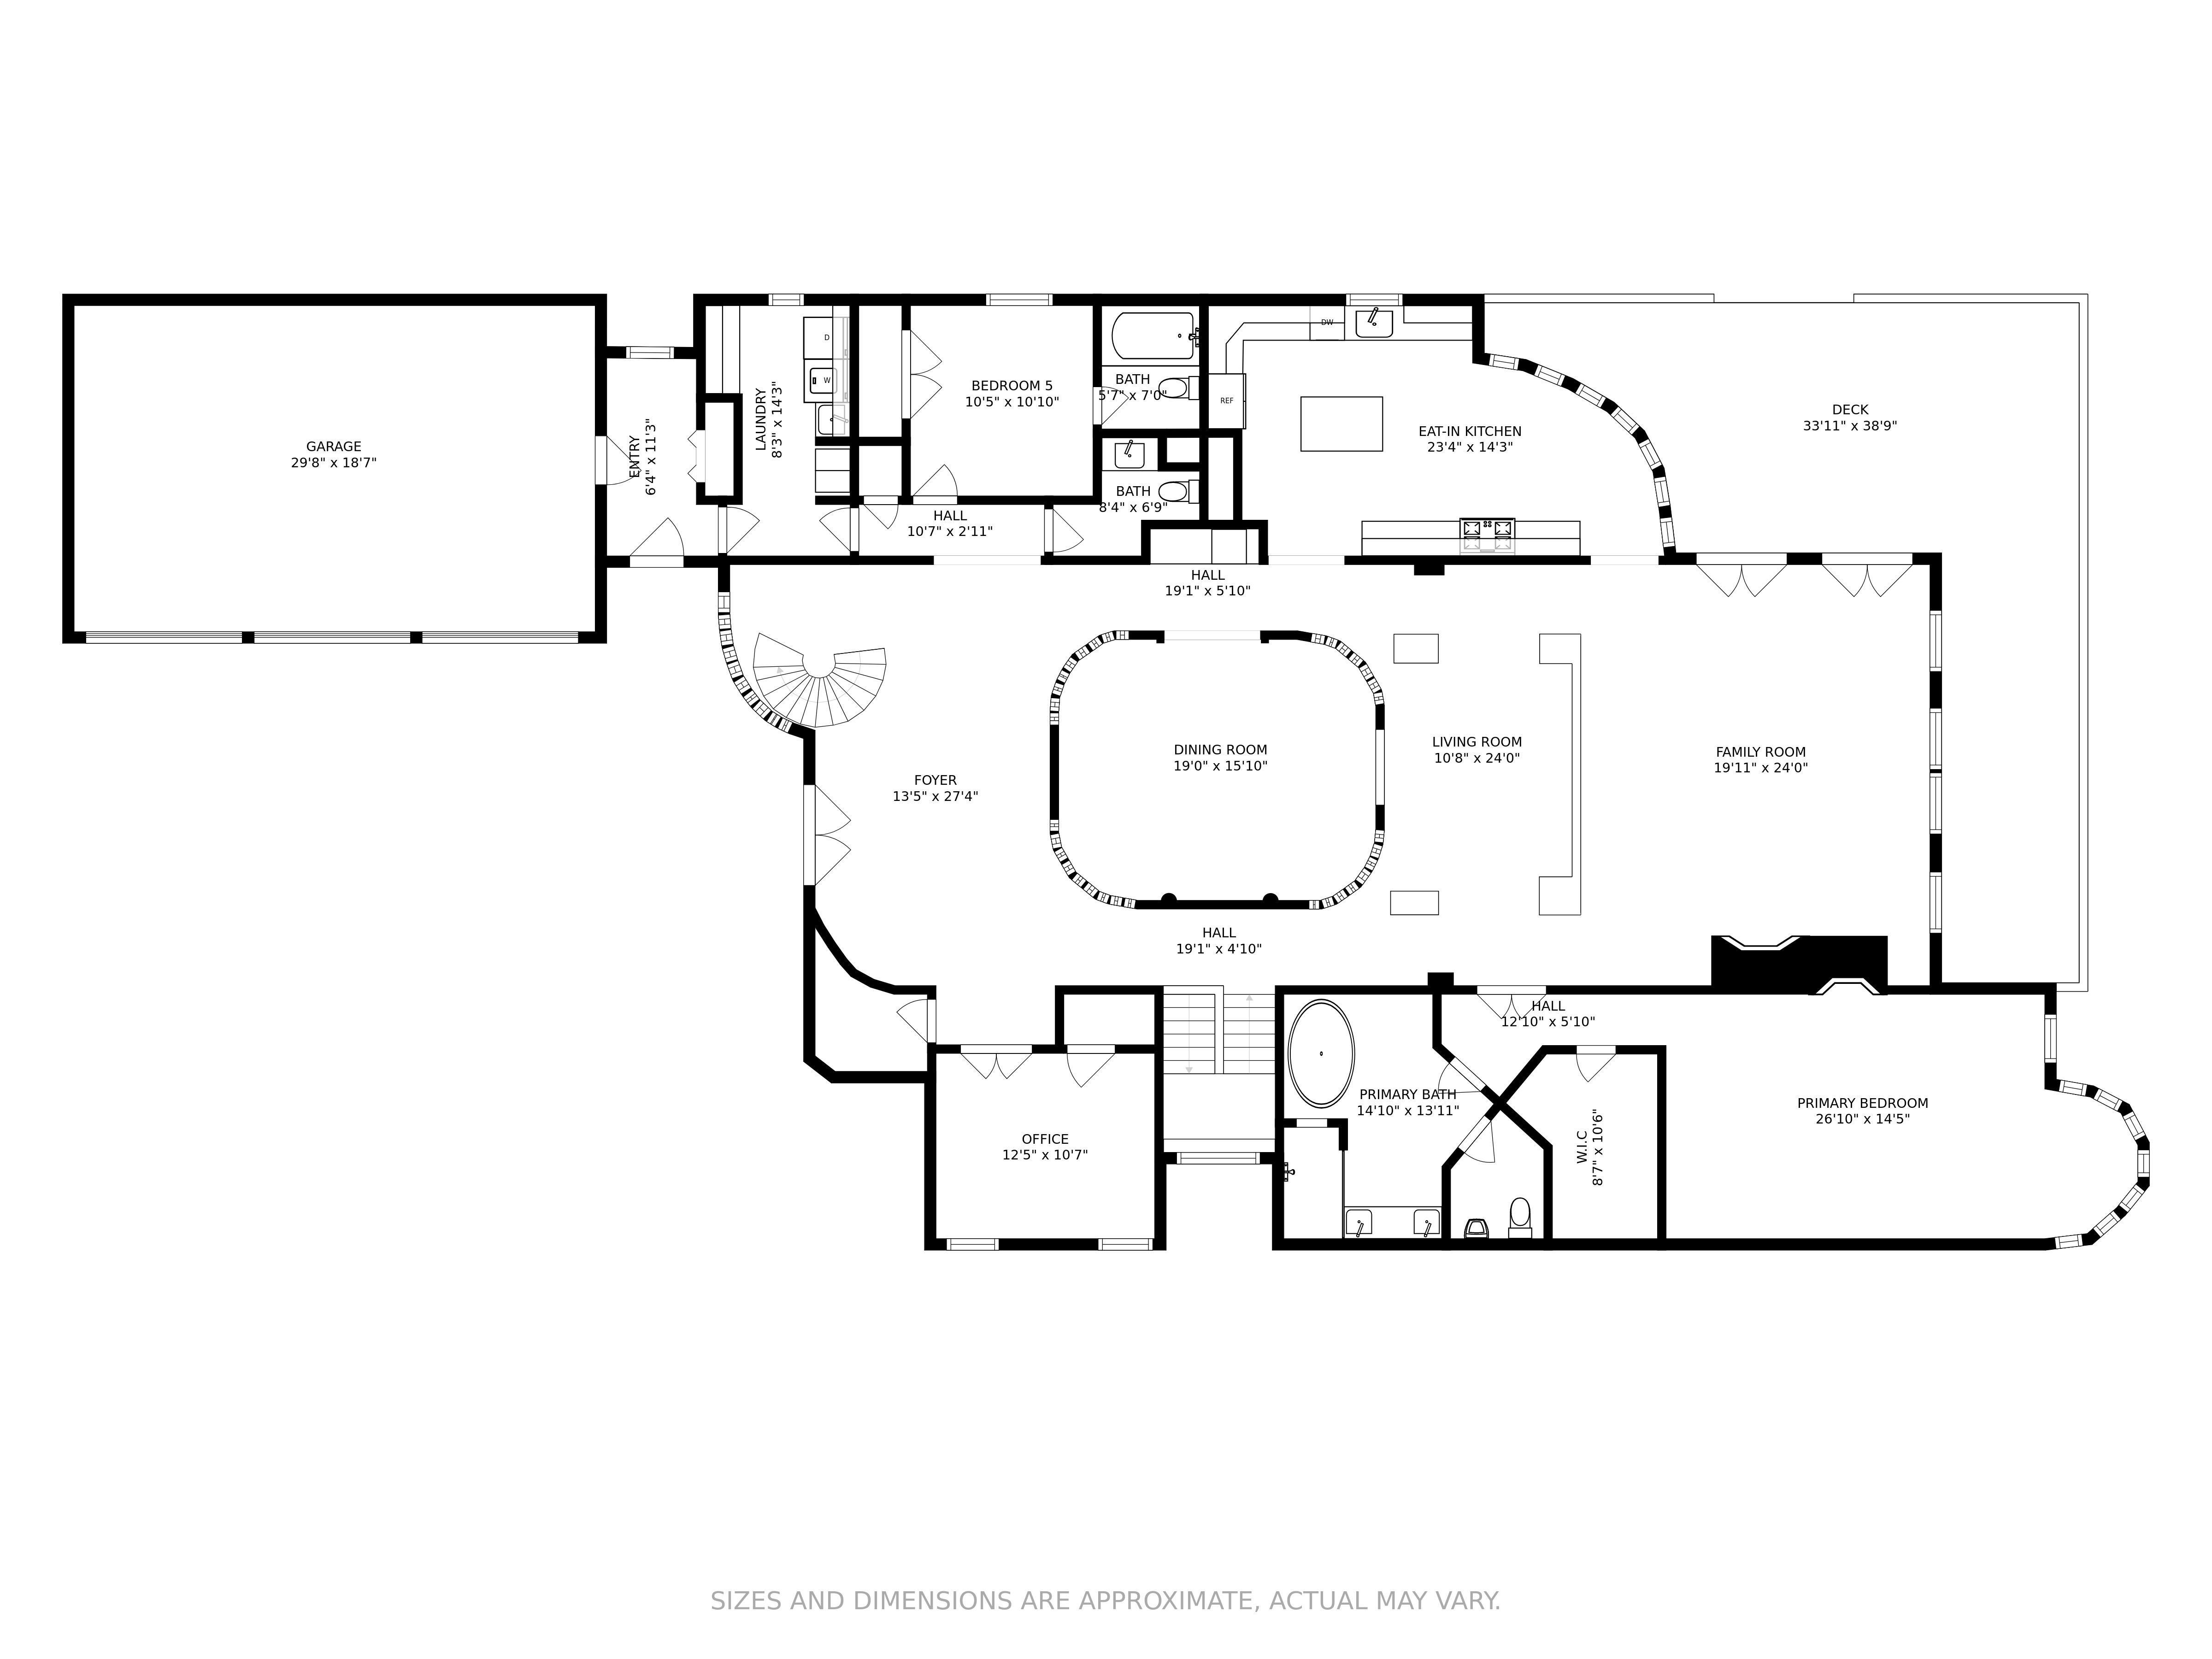 Real Estate Floor Plan Services Vht Studios